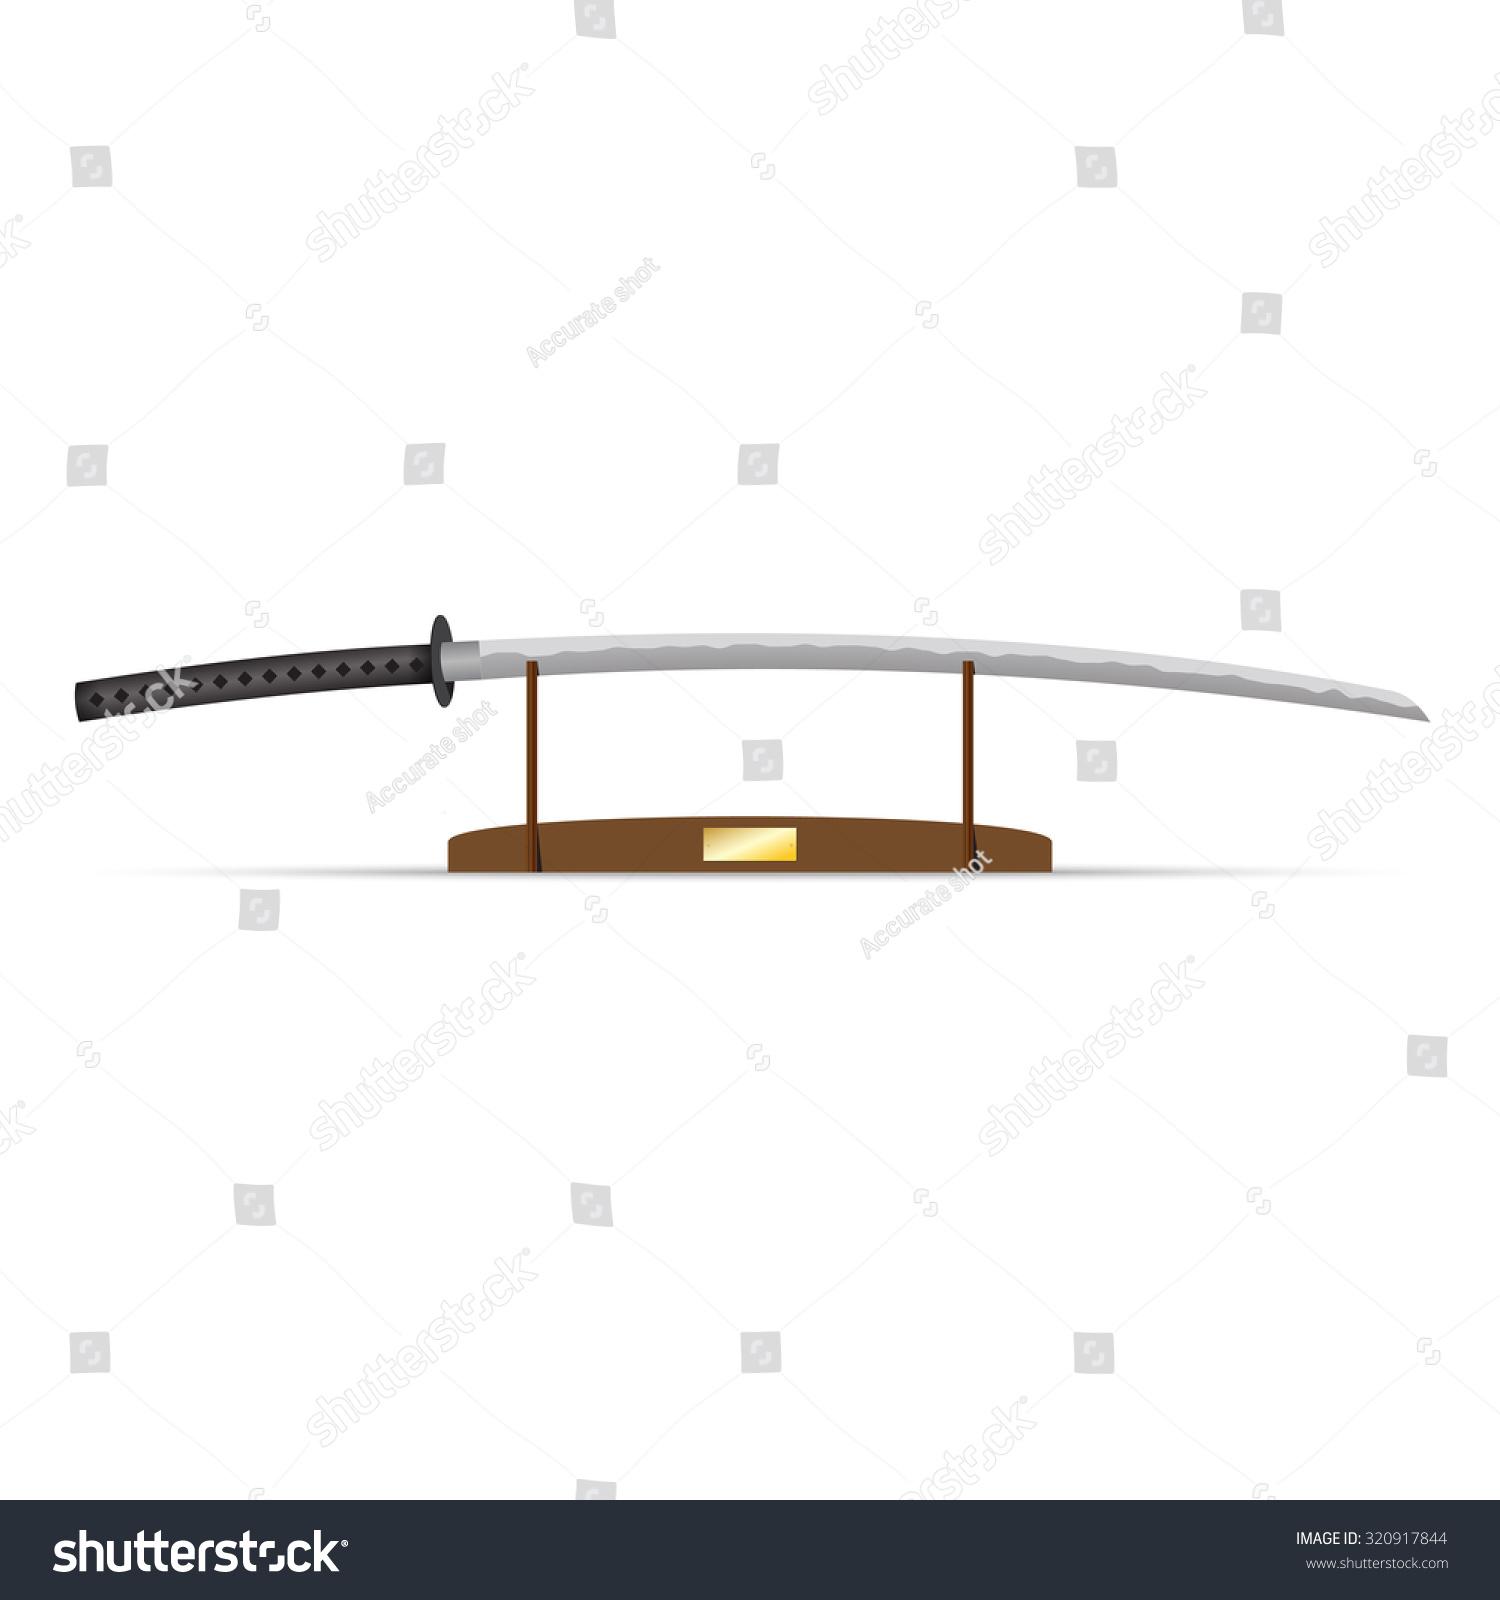 hight resolution of vector illustration of katana ninja sword on stand